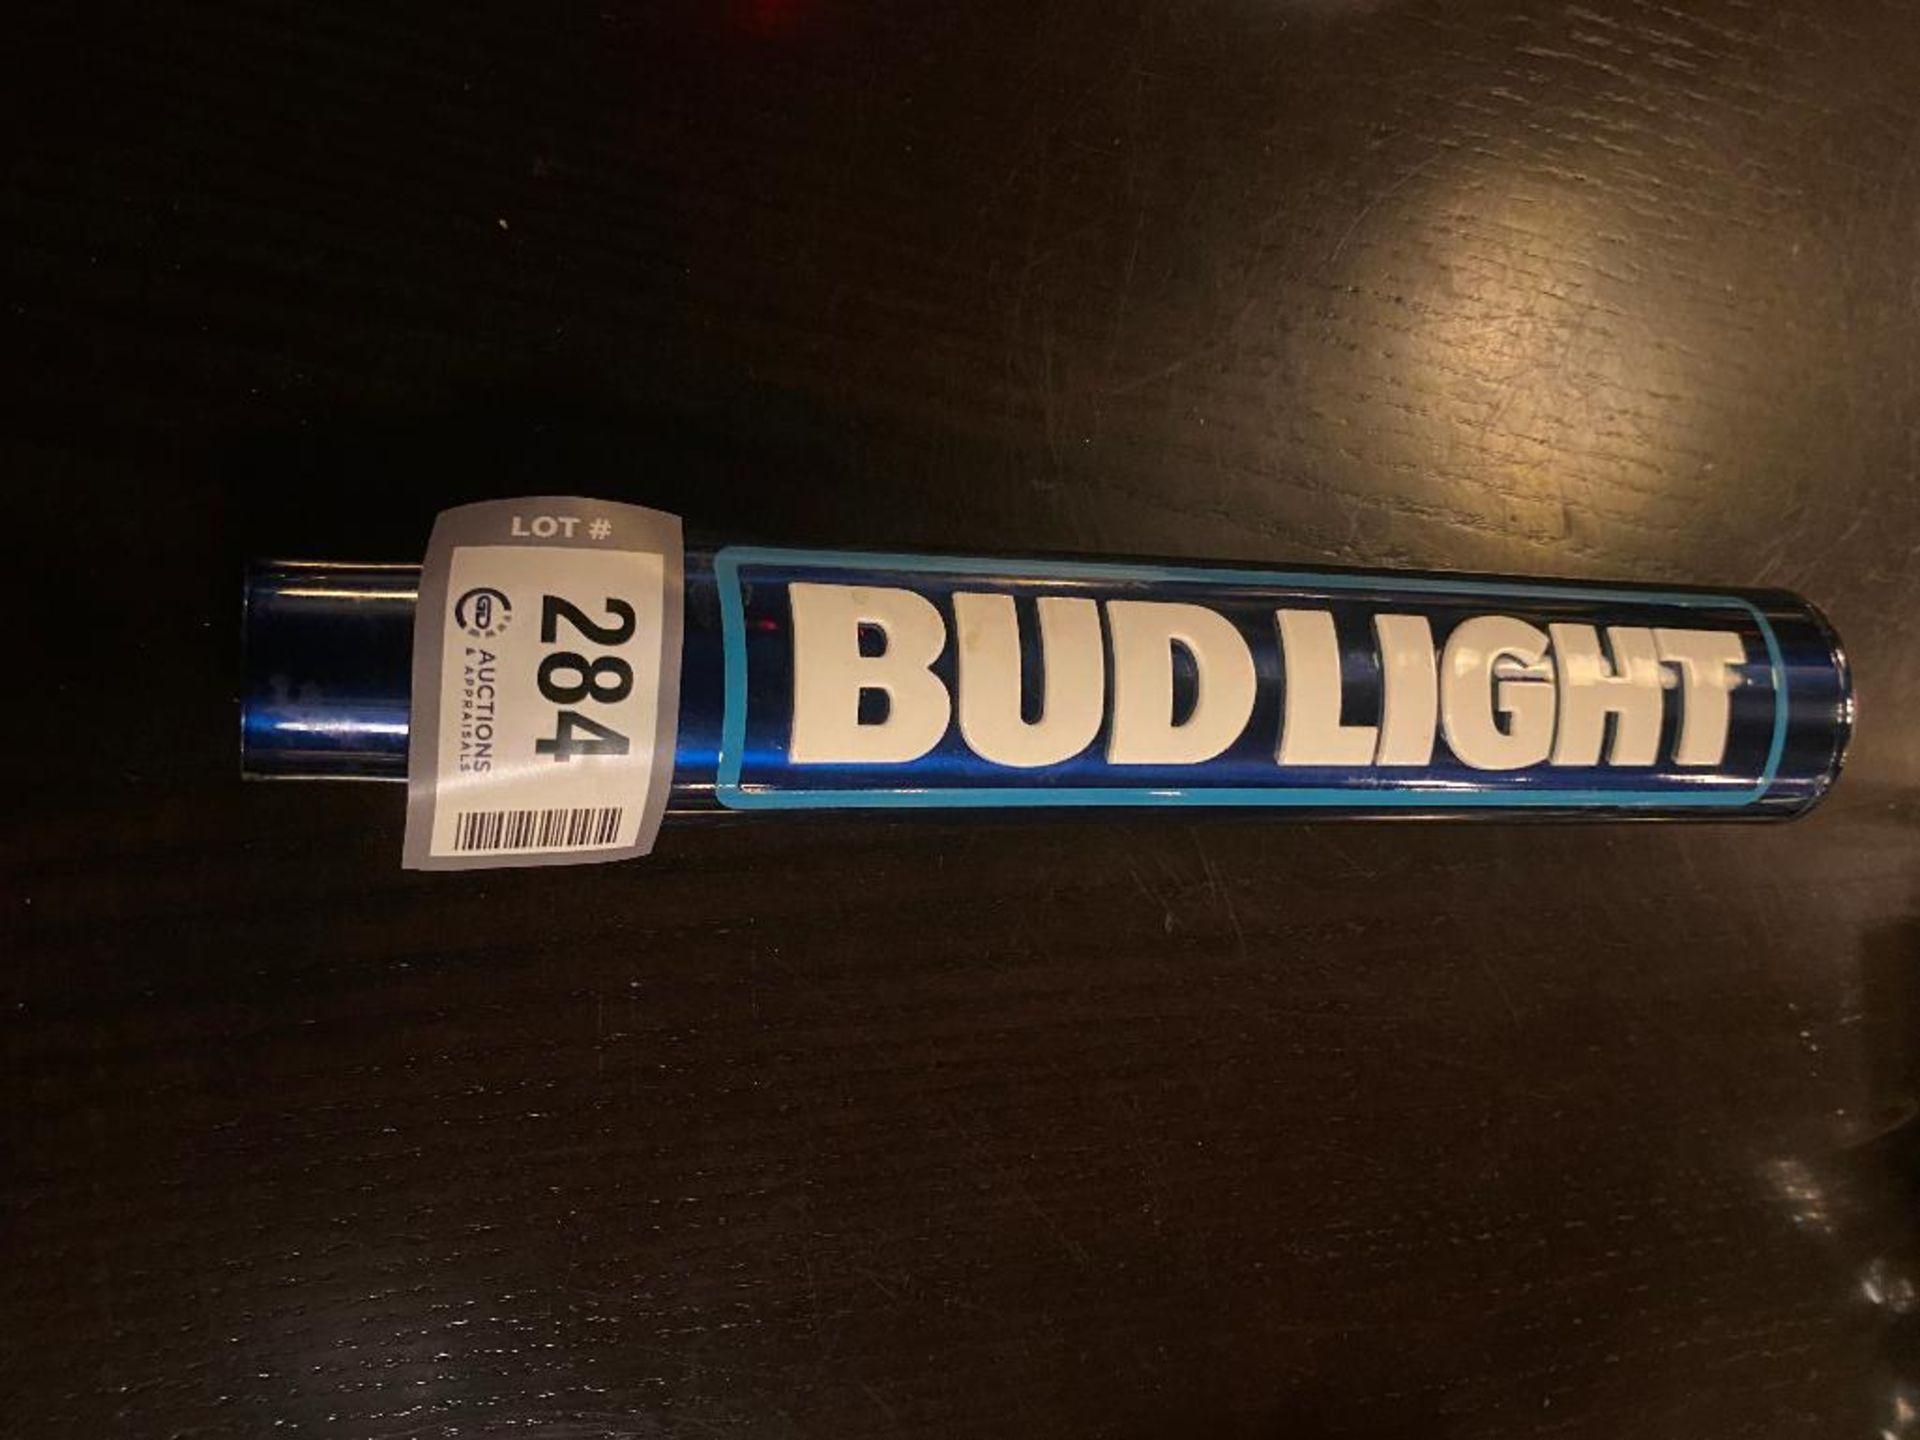 BUD LIGHT BEER TAP